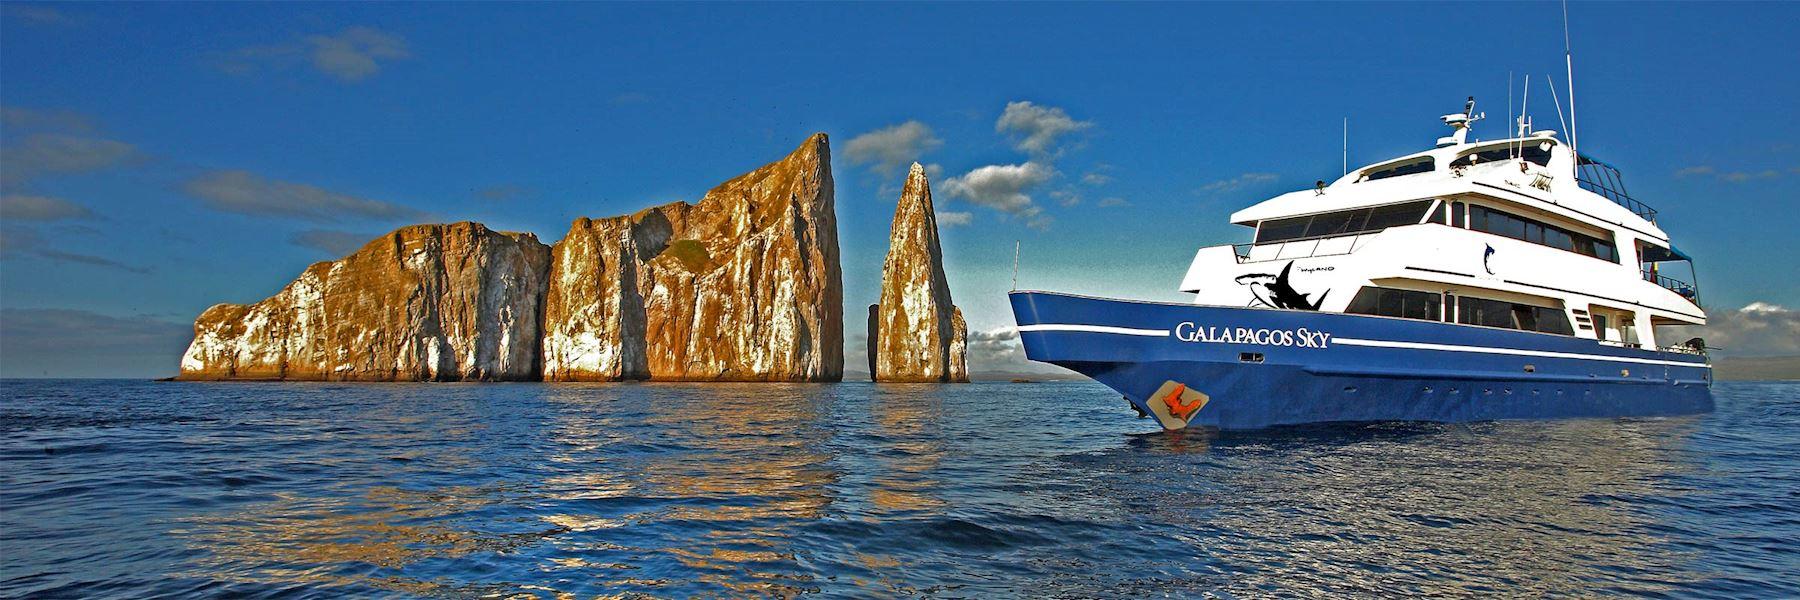 Cruise Ships in The Galapagos Islands: Galapagos Sky